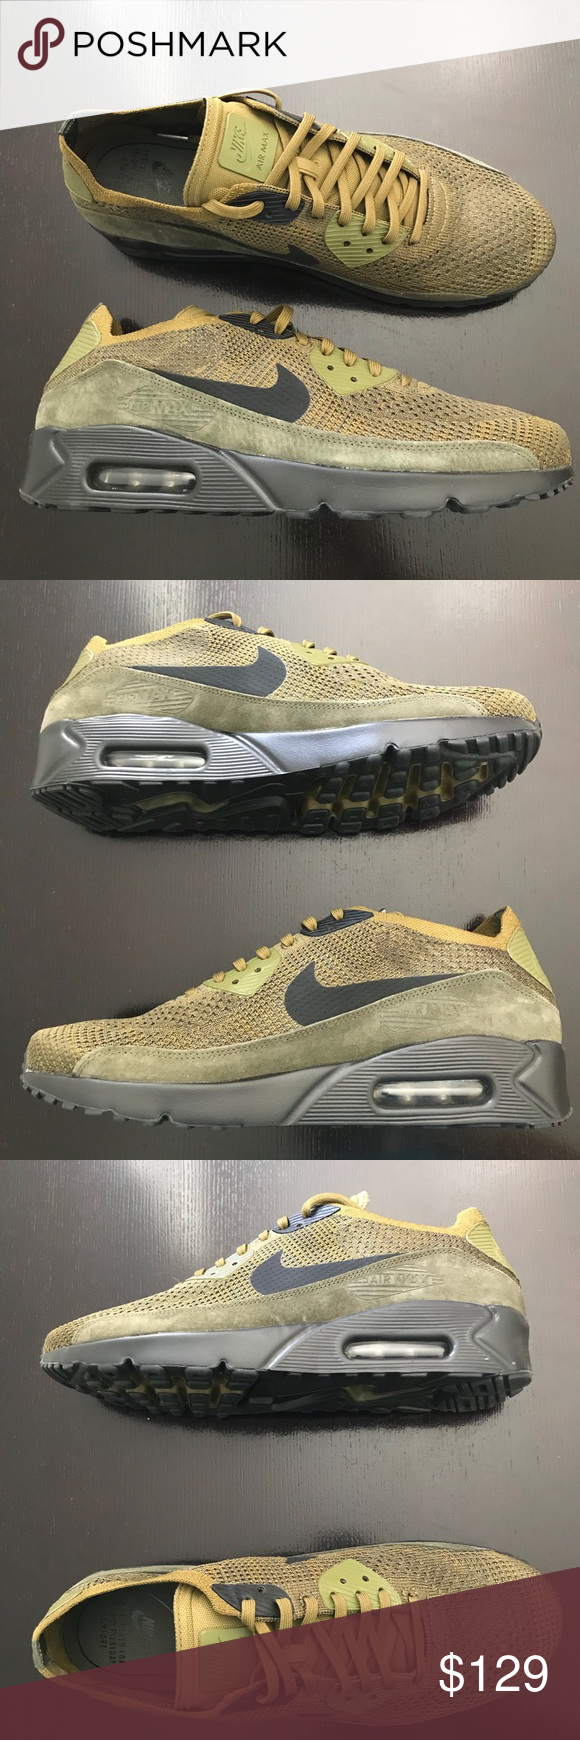 d38a921d77 Nike Air Max 90 Ultra 2.0 Flyknit Men's Shoes Color: Olive Flak / Black / Cargo  Khaki Style #: 875943-302 Size: 11 100% authentic.